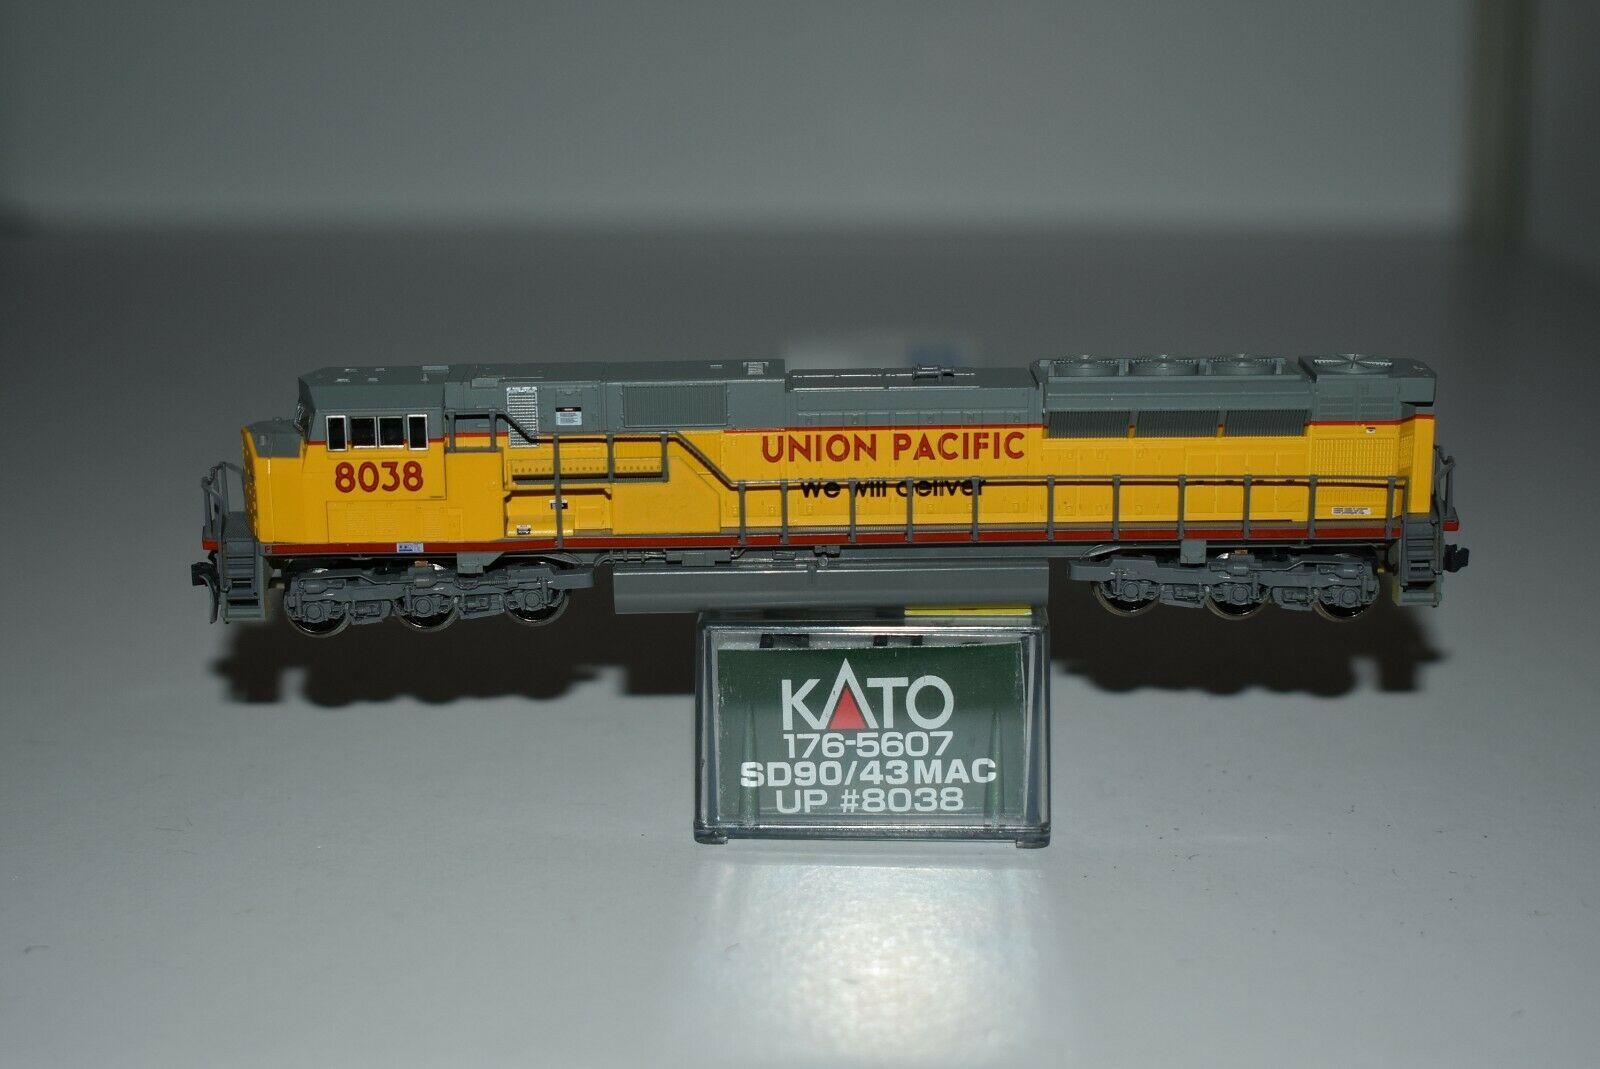 N Scale - Kato USA - 176-5607 - Locomotive, Diesel, EMD SD90MAC - Union Pacific - 8038